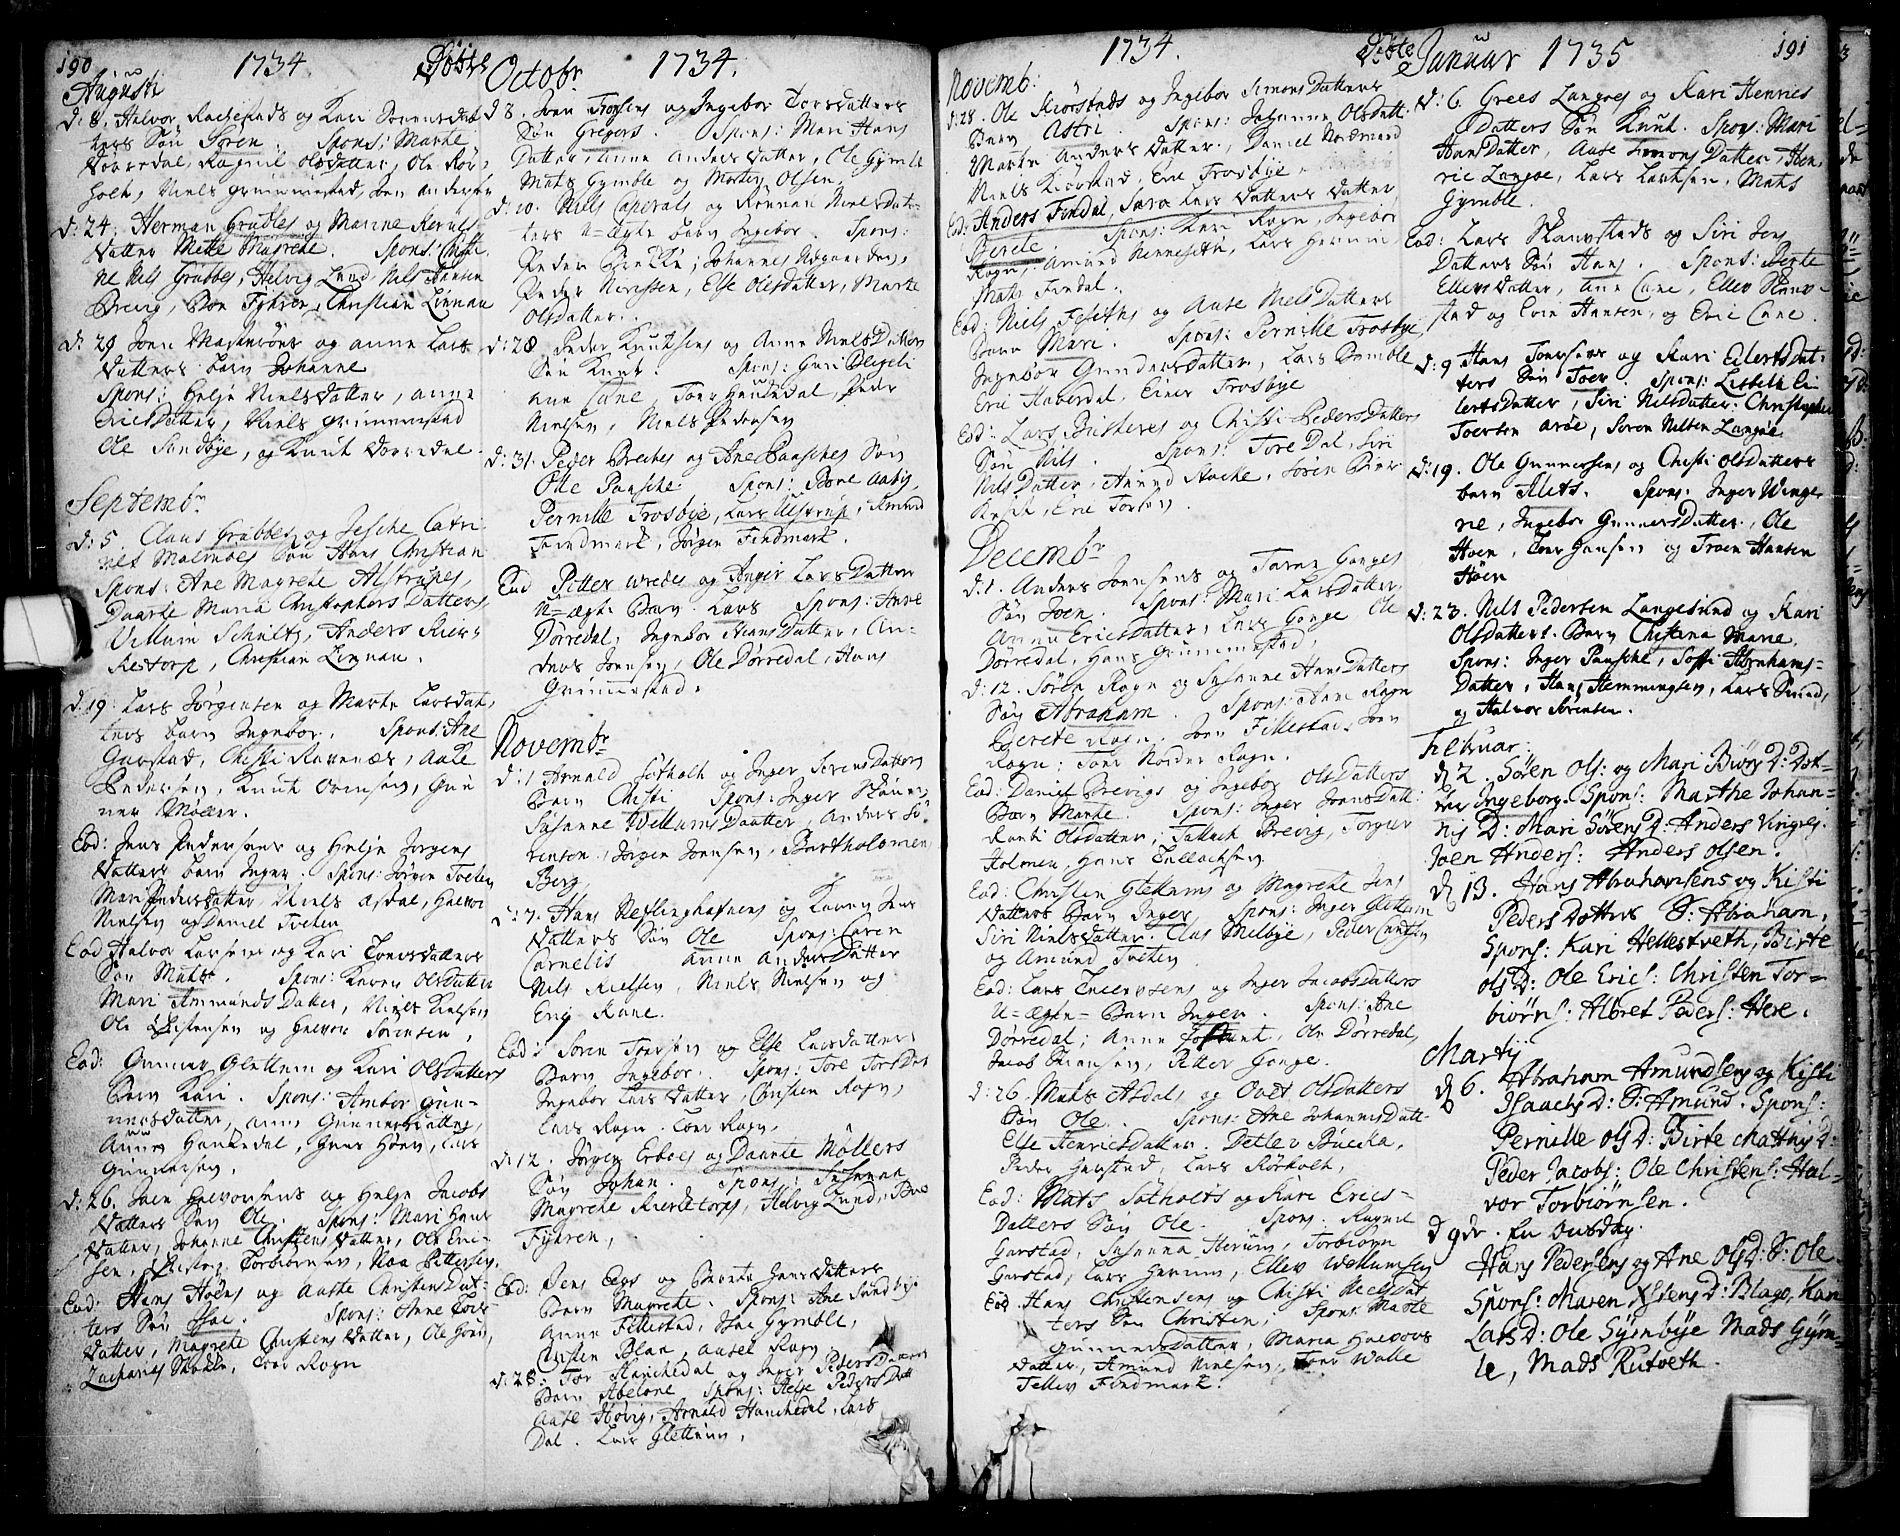 SAKO, Bamble kirkebøker, F/Fa/L0001: Ministerialbok nr. I 1, 1702-1774, s. 190-191